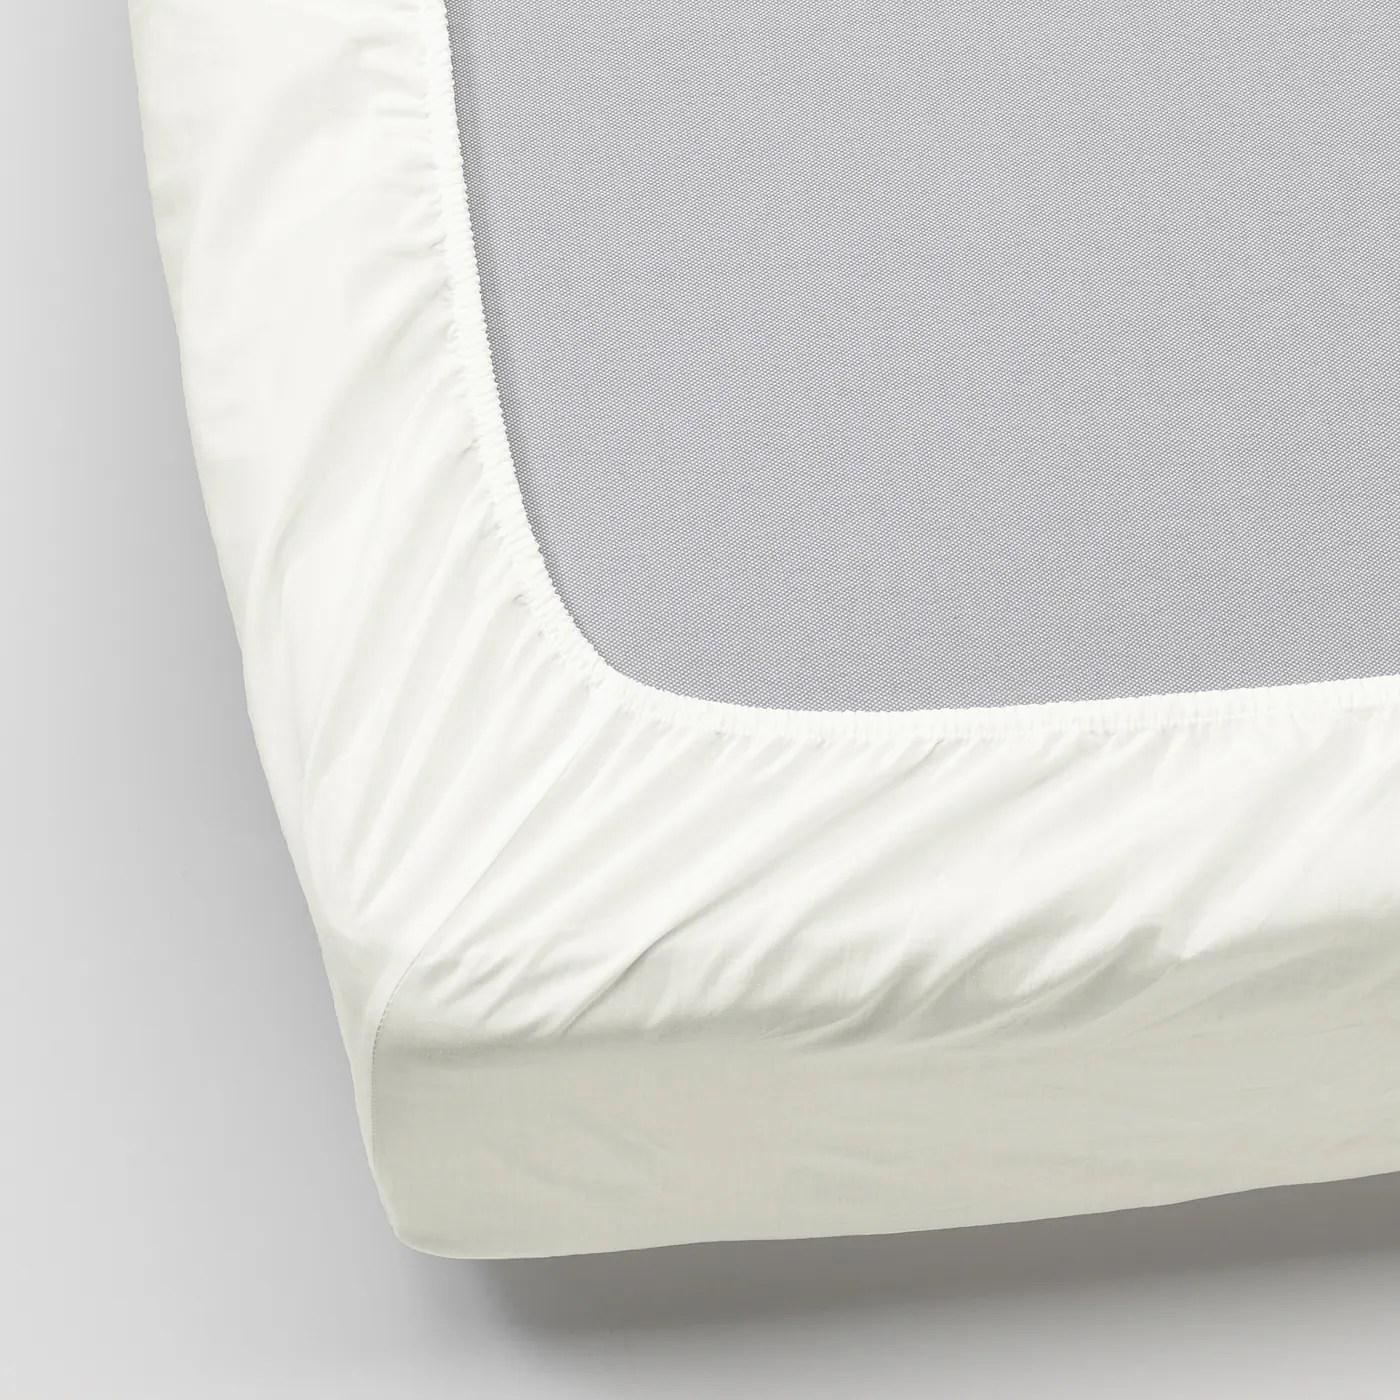 Ullvide Drap Housse Blanc 90x200 Cm Materiau Durable Ikea